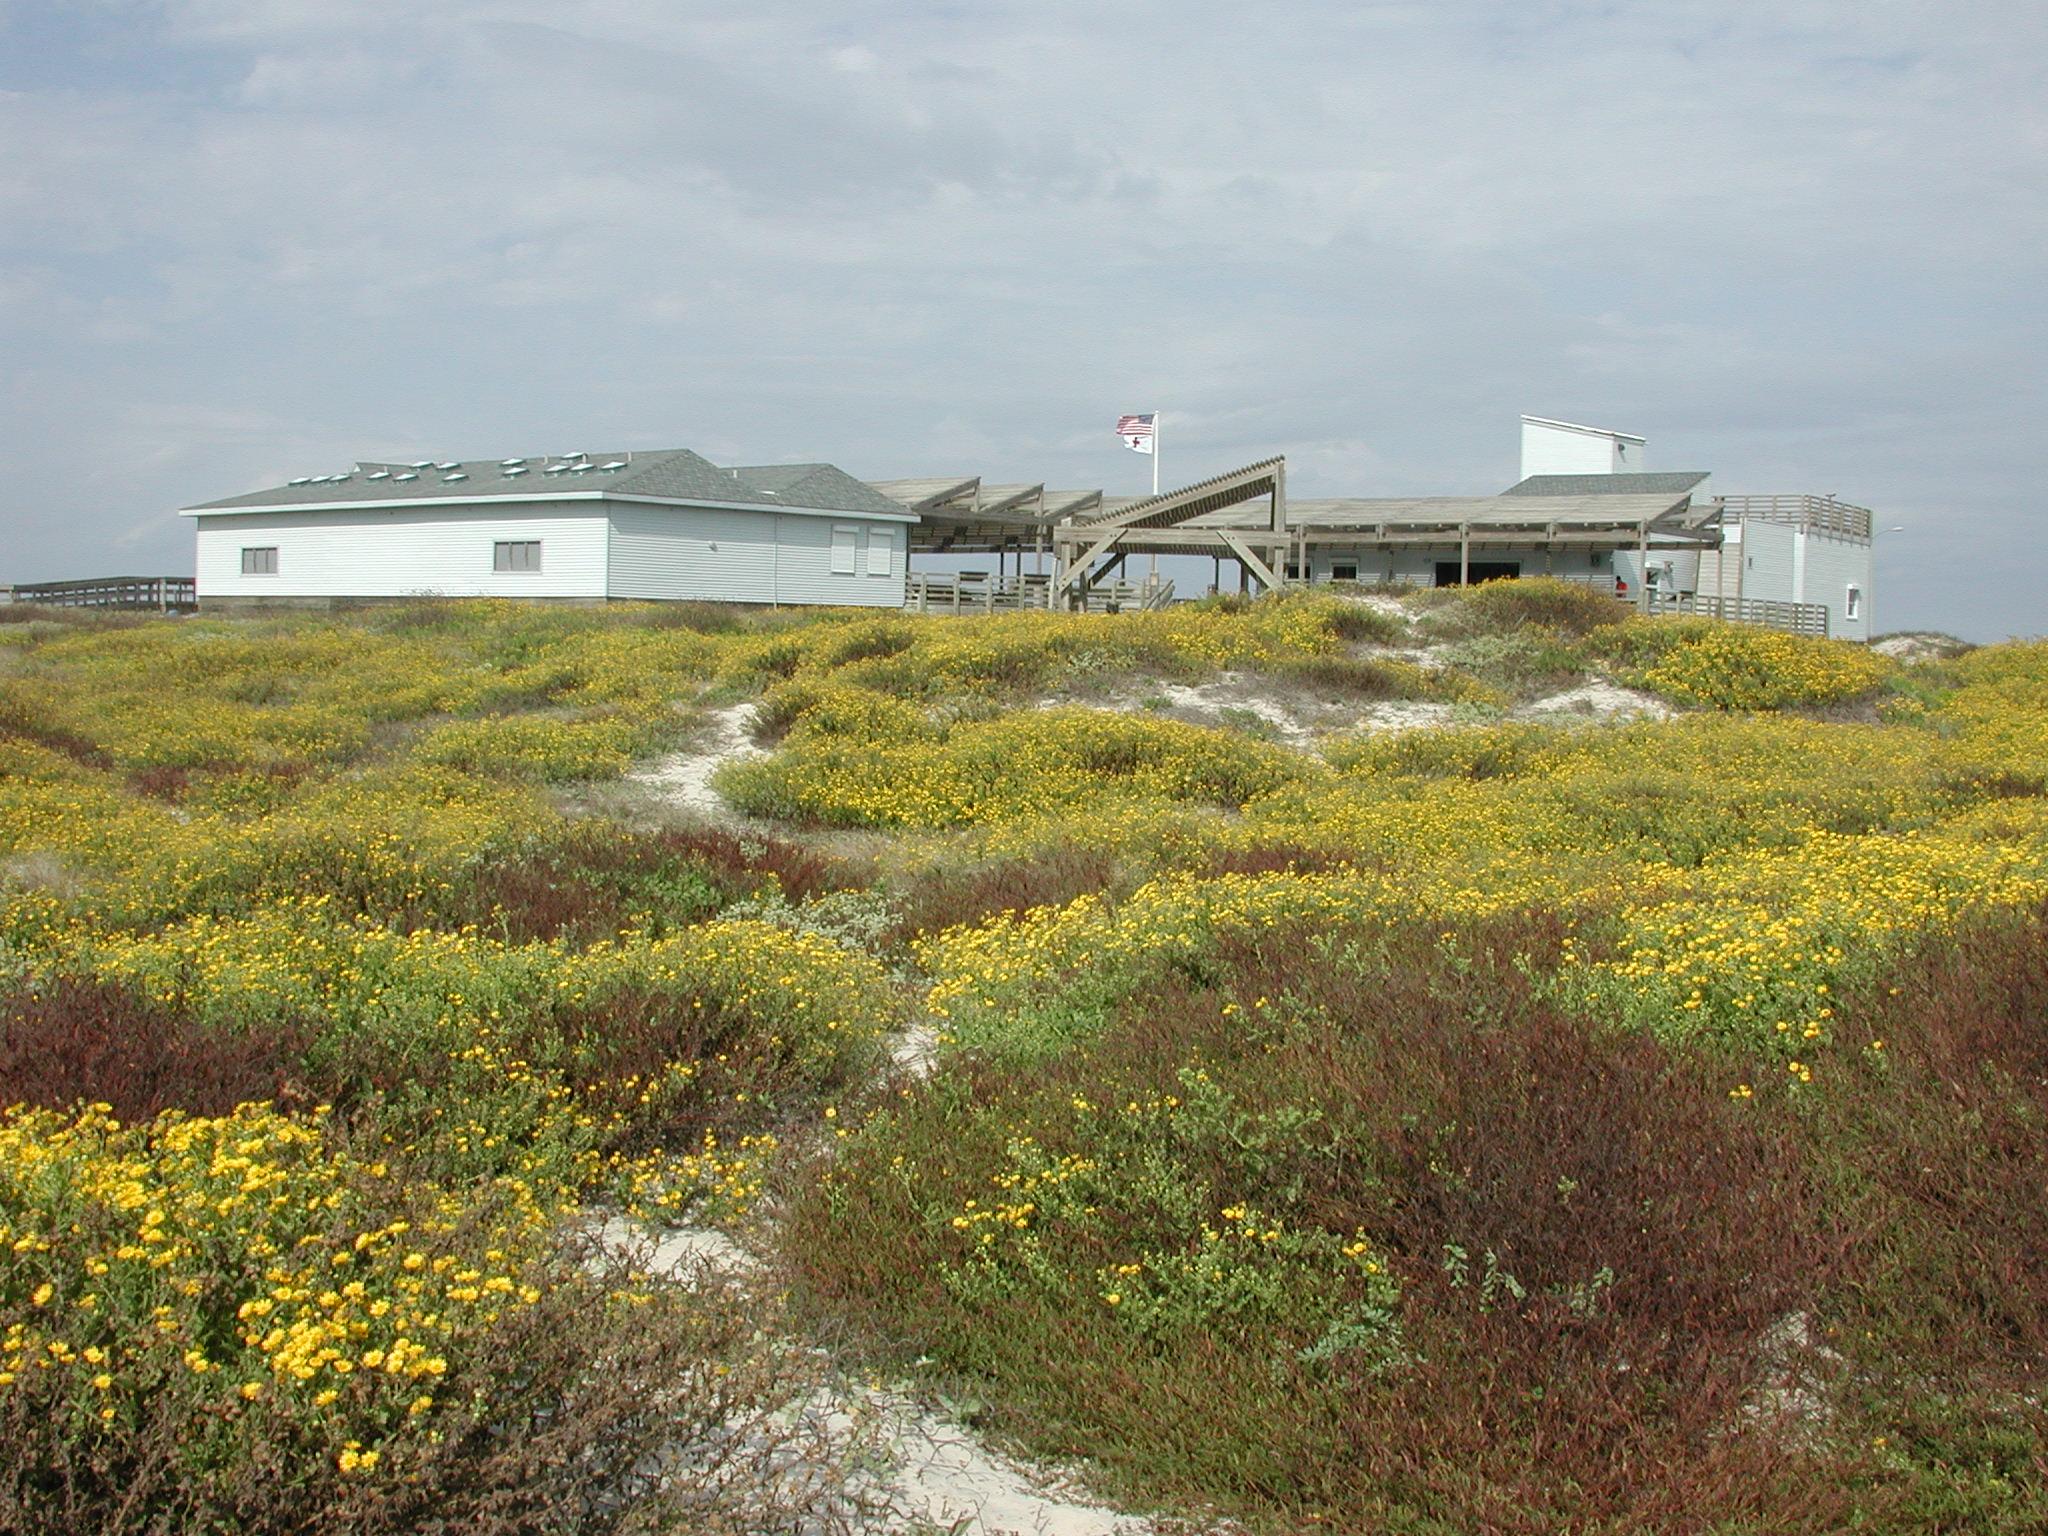 The Nearest Gas Station >> Visitor Center - Padre Island National Seashore (U.S ...